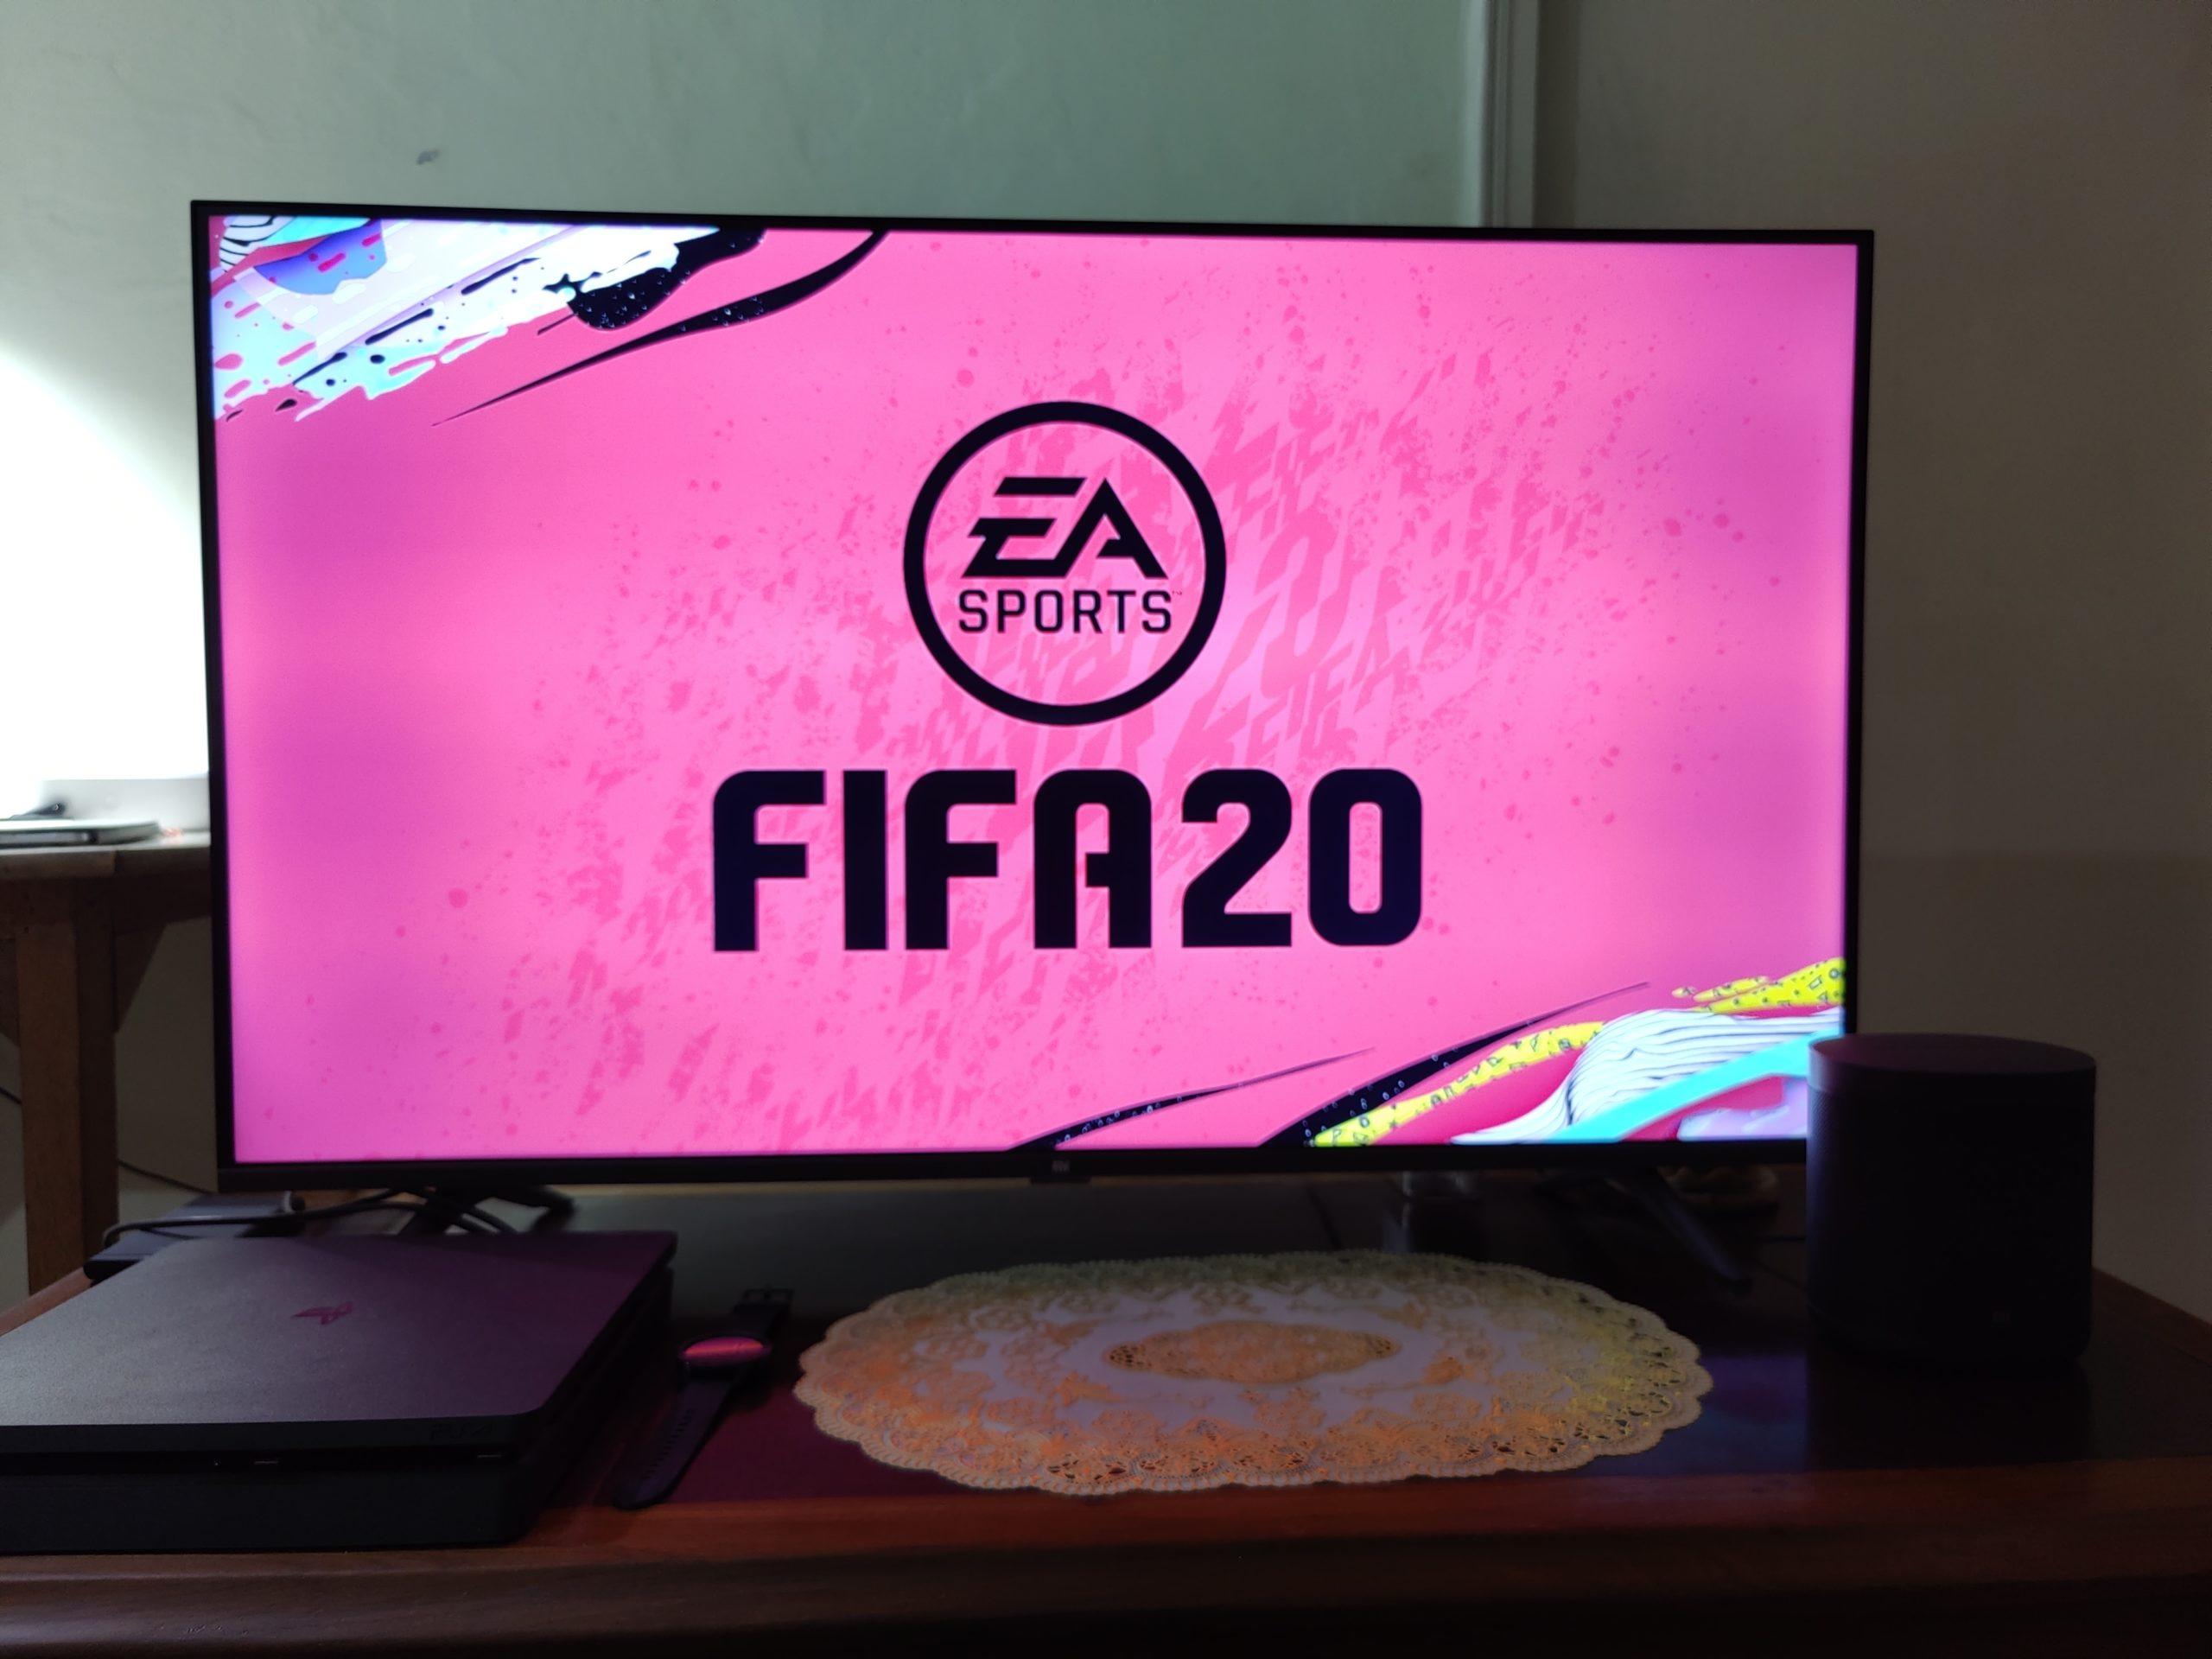 Mi TV 4A Horizon Edition